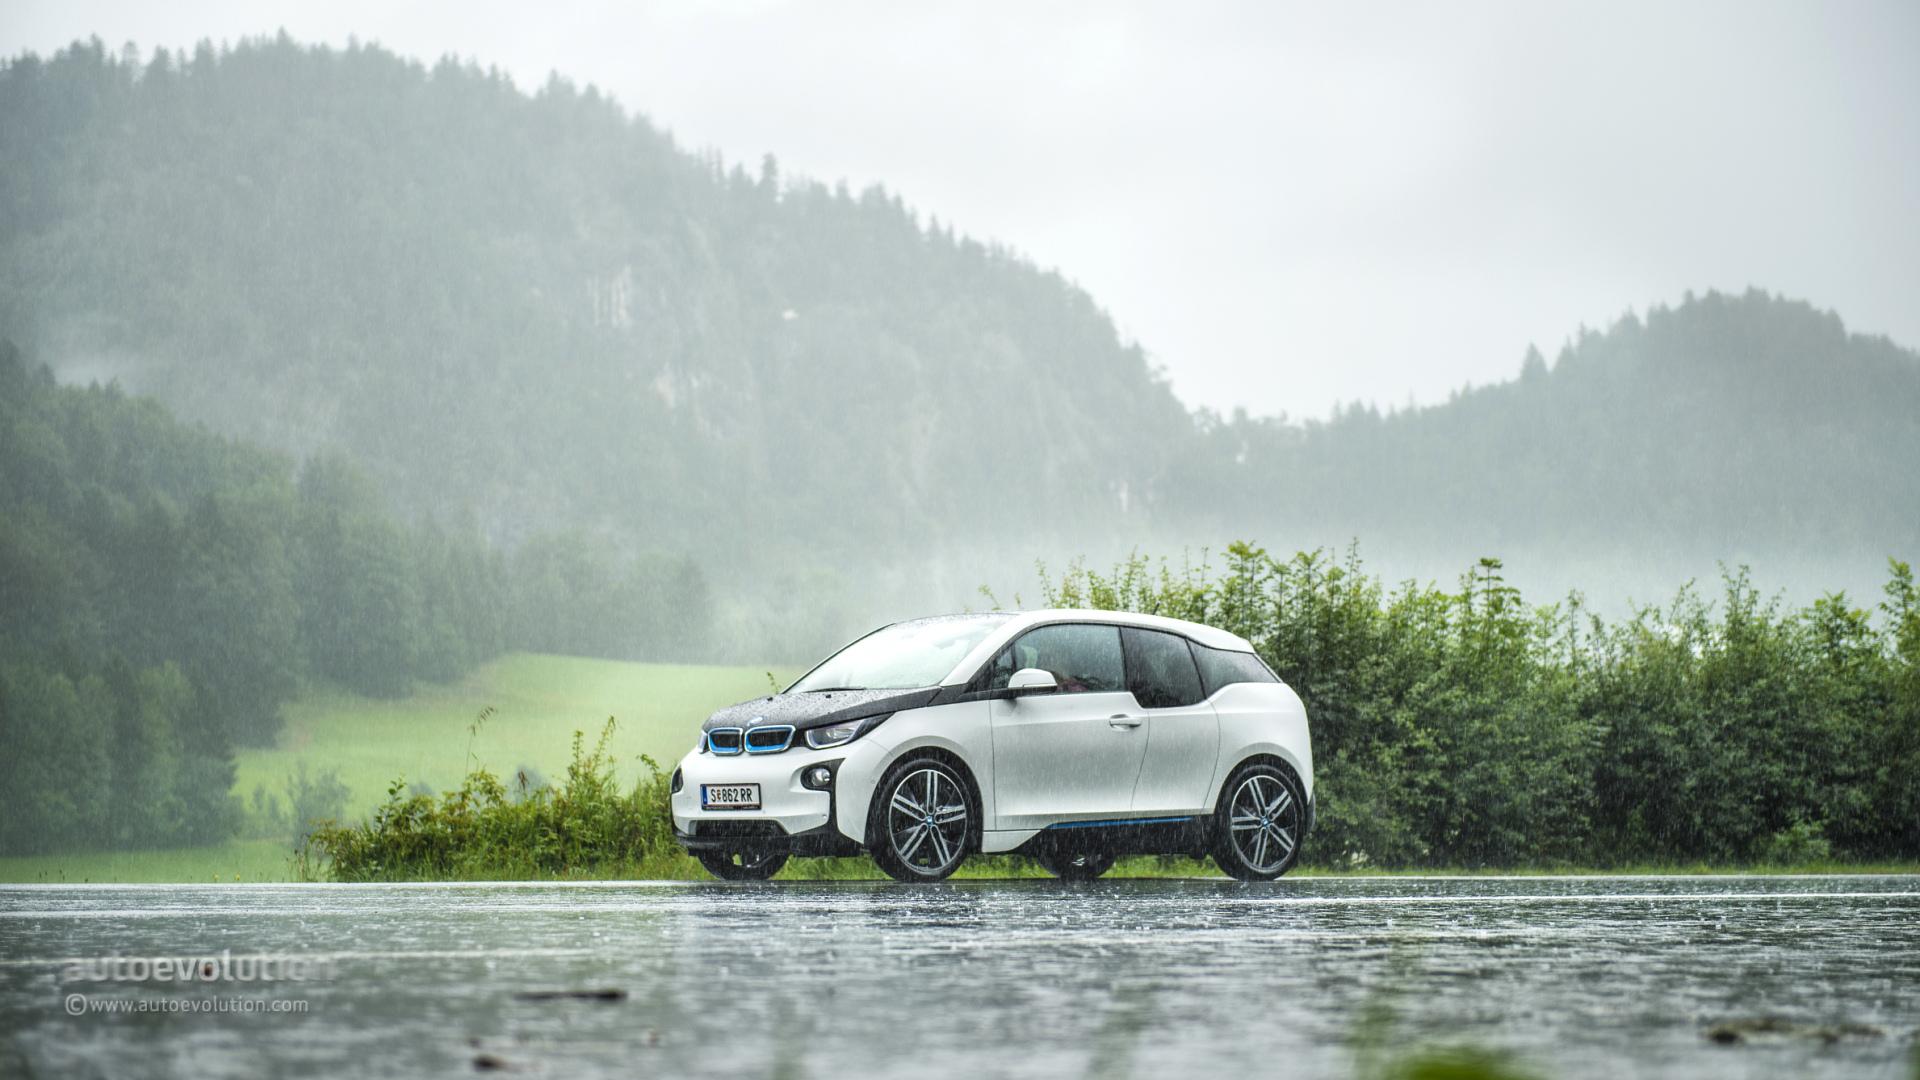 BMW i3 HD Wallpapers - autoevolution